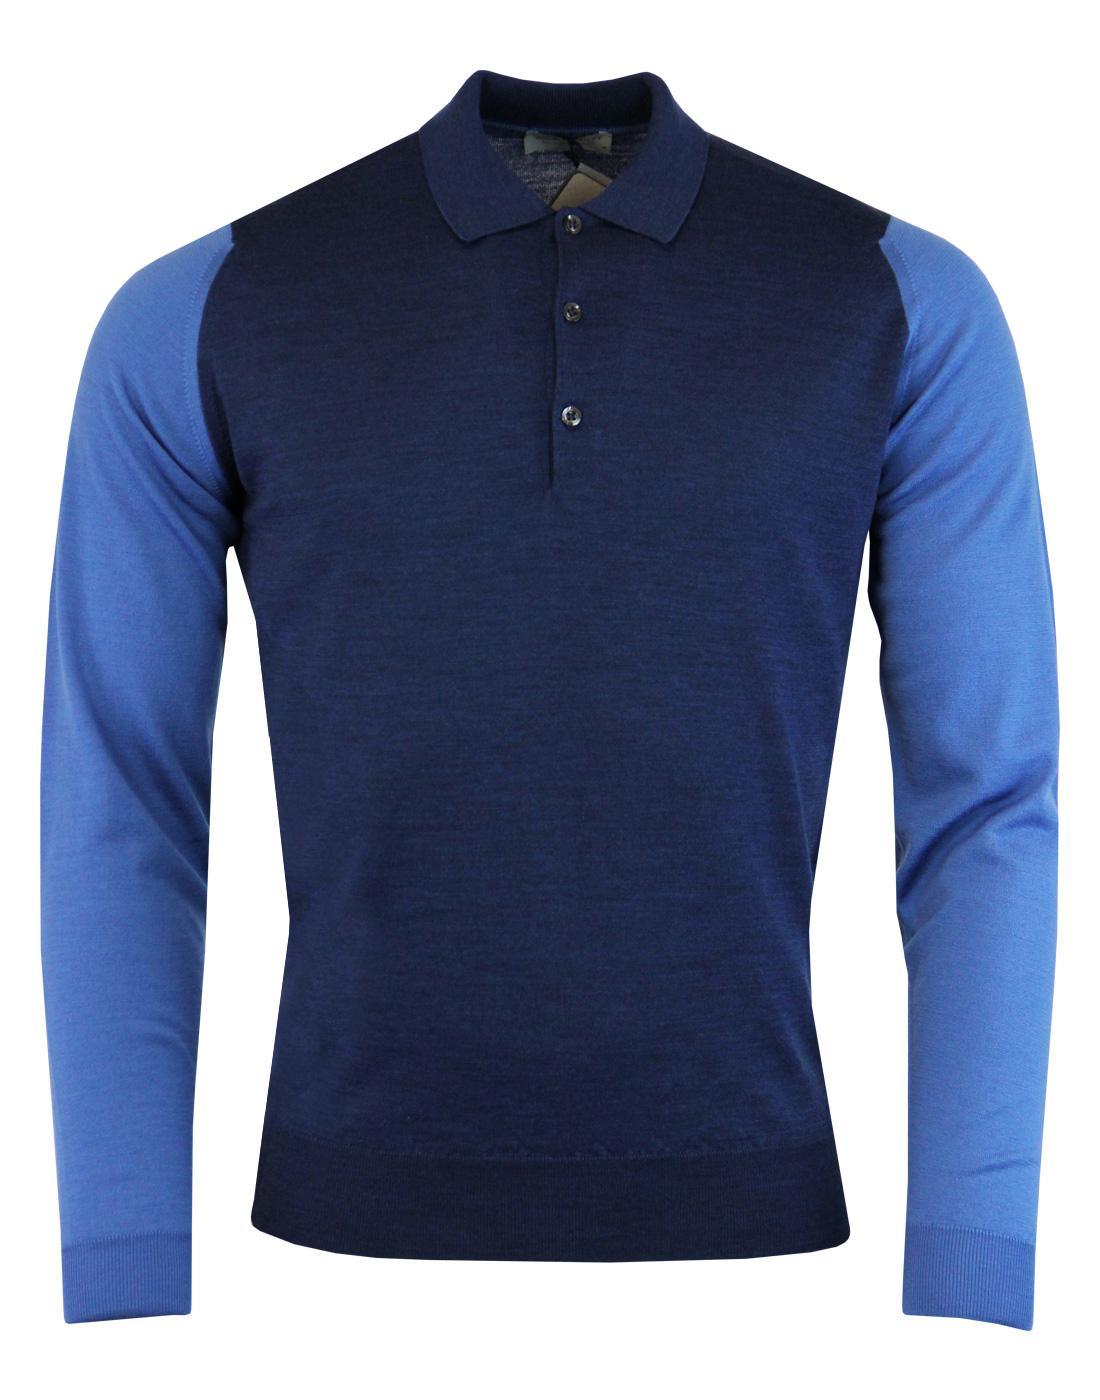 Brightgate JOHN SMEDLEY Made in England Polo Shirt